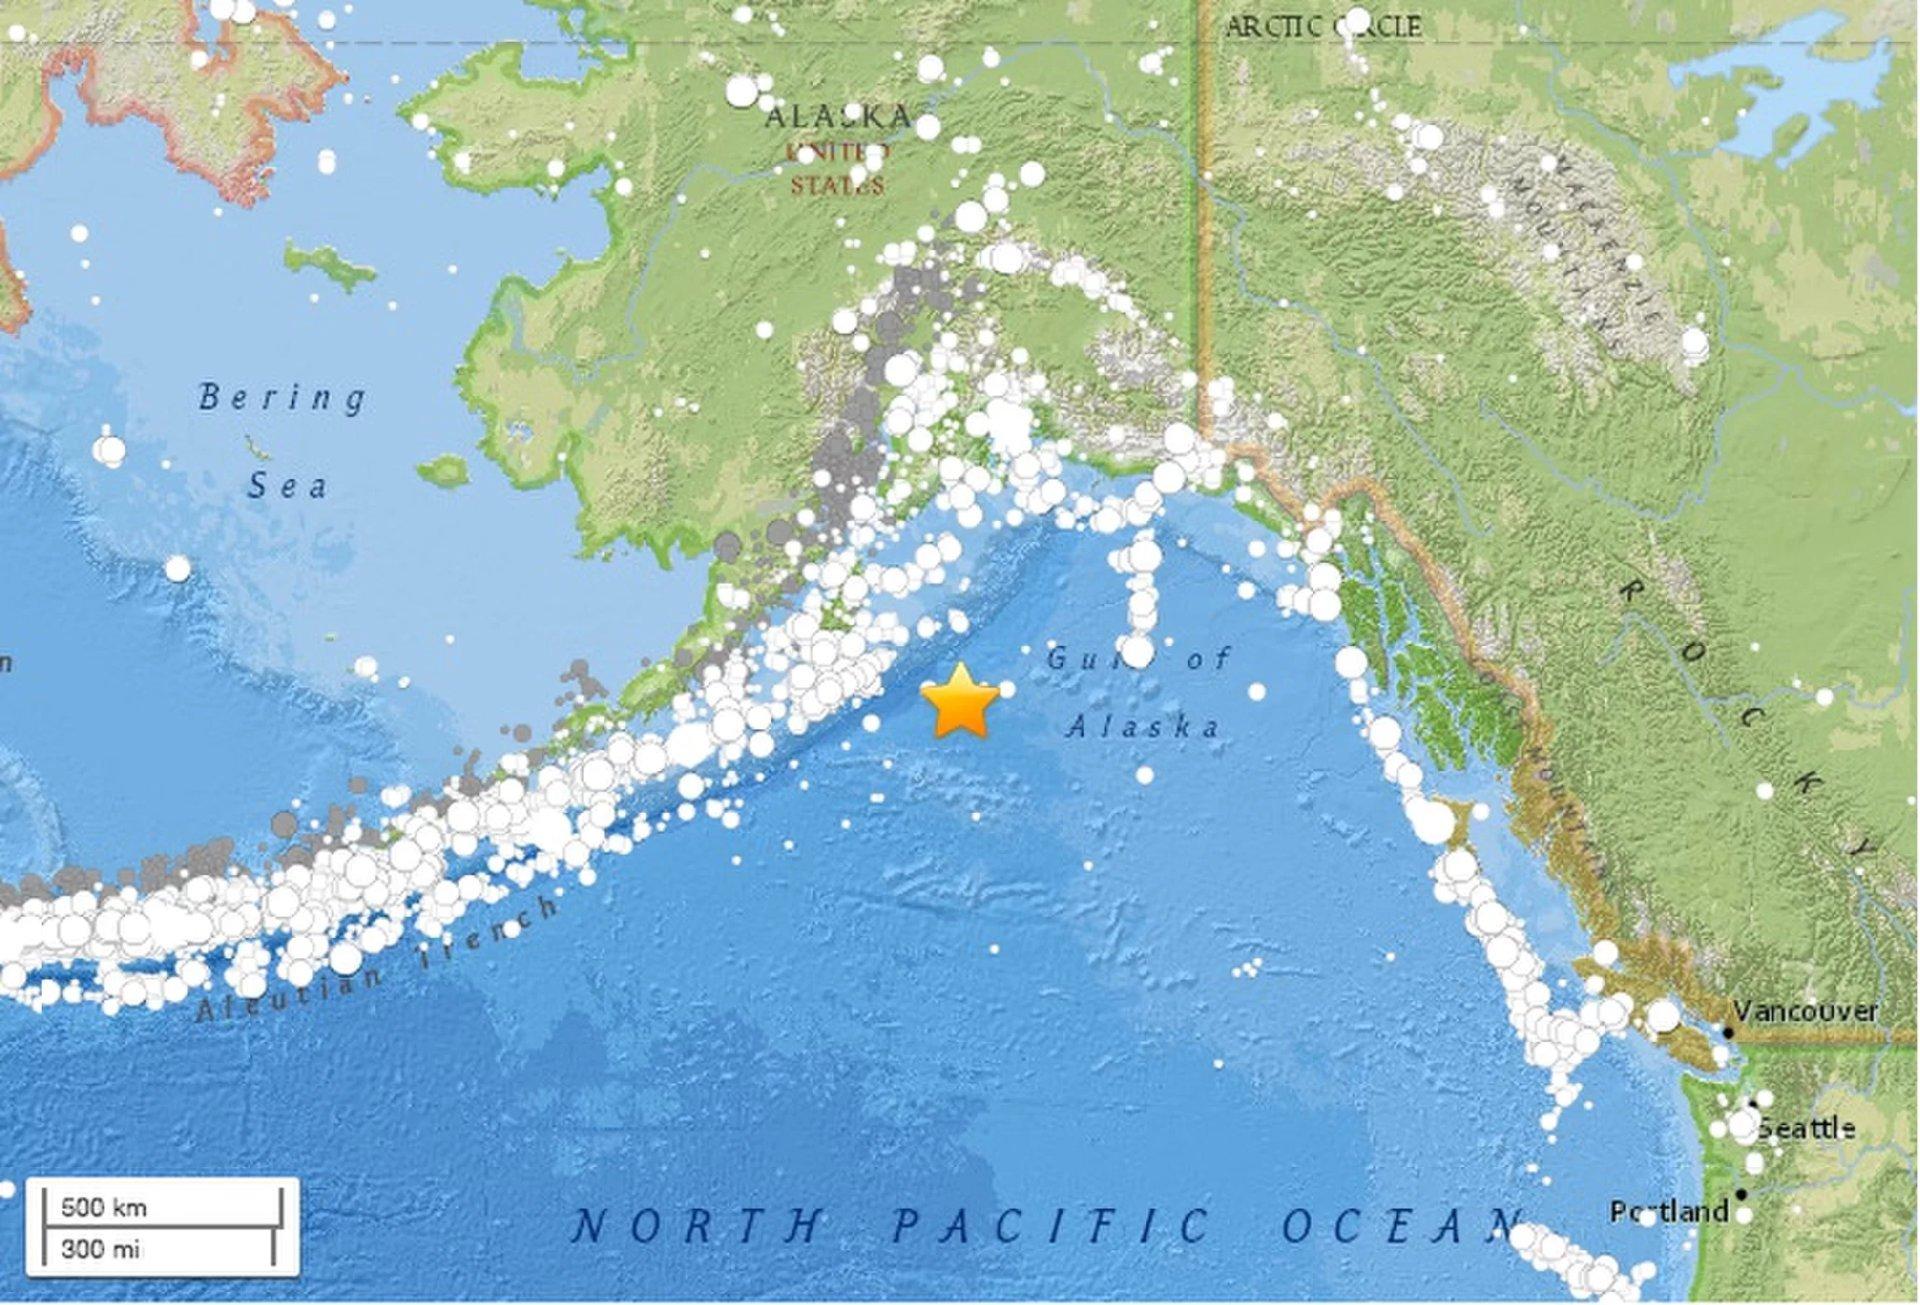 Un fuerte terremoto desencadenó esta mañana la alerta de Tsunami en Alaska y parte de E.E.U.U. 1